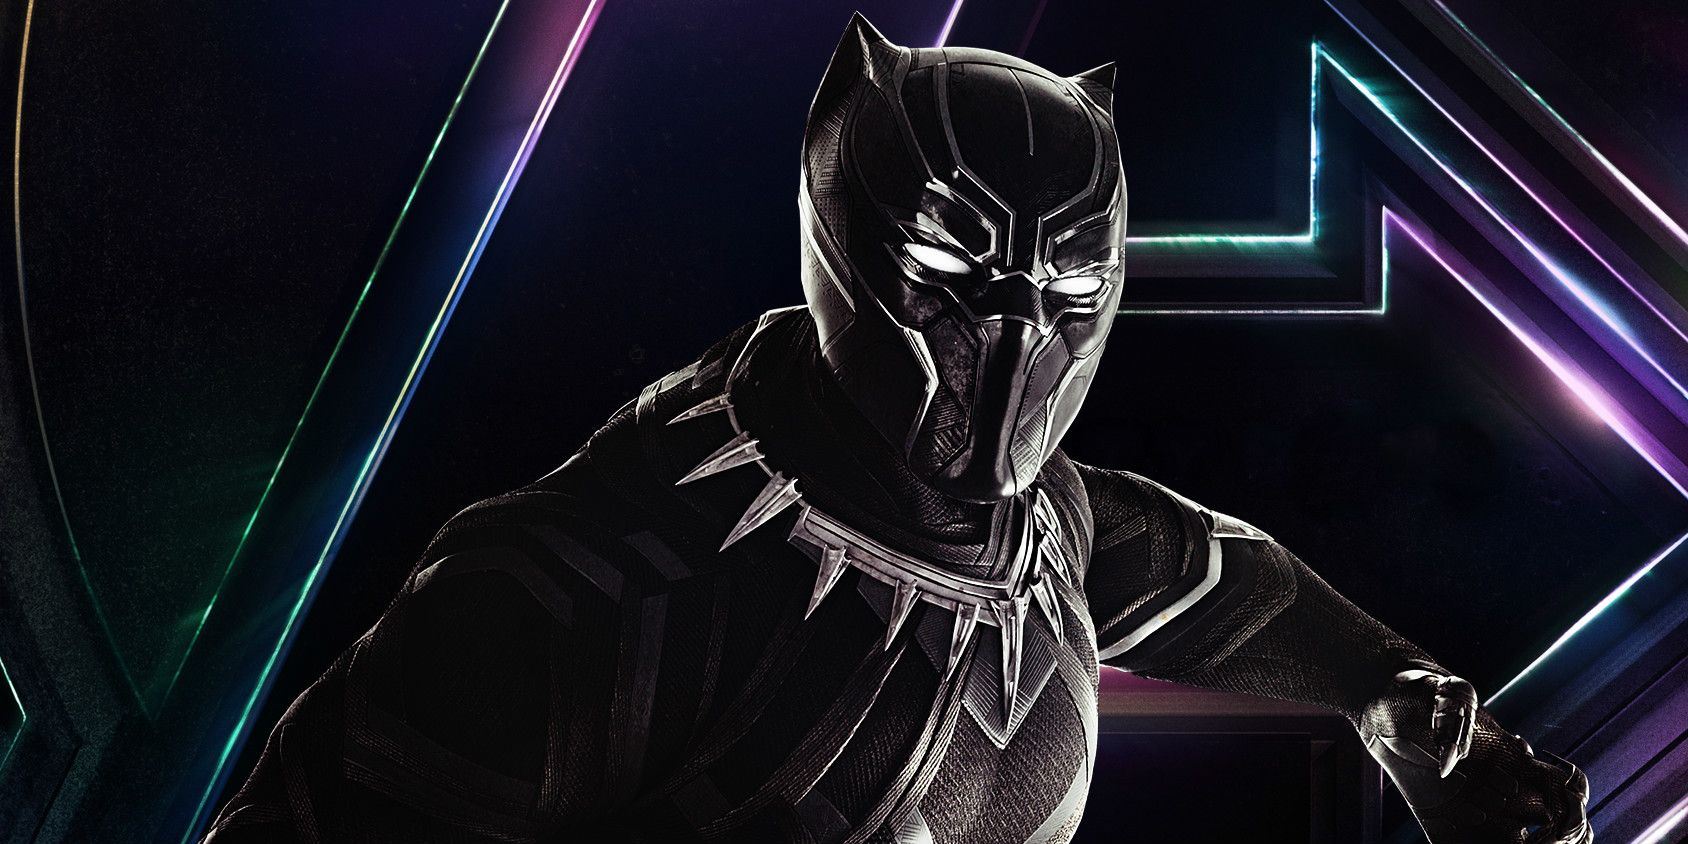 Marvel Black Panther Black Panther Avengers Infinity: Black Panther & Infinity War Teams Collaborate On Wakanda